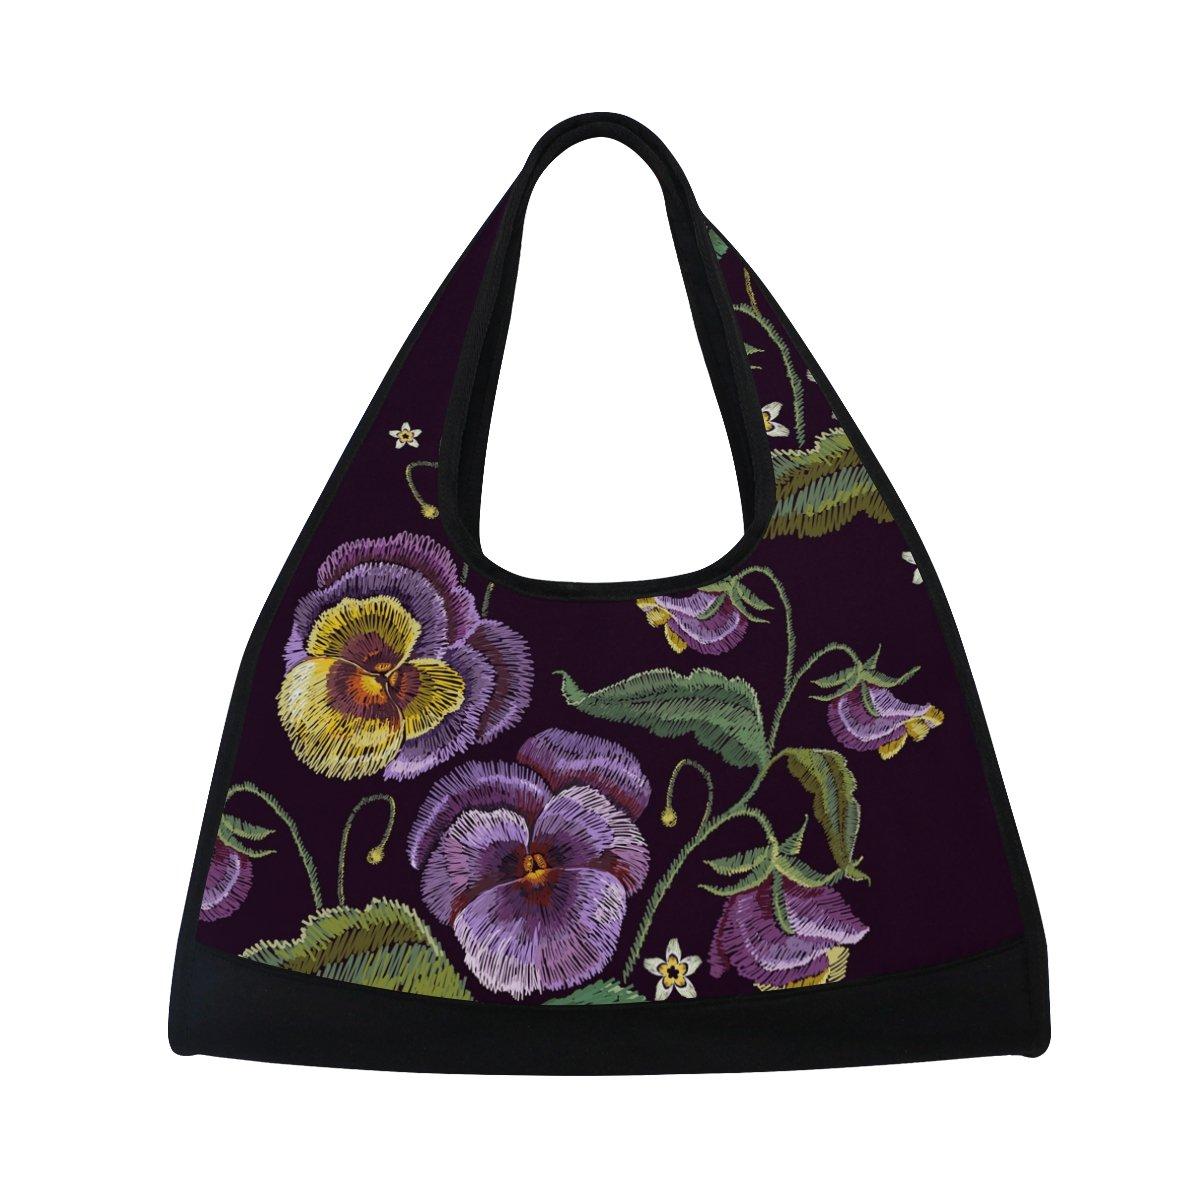 AHOMY Sports Gym Bag Flower Leaf Embroidery Duffel Bag Travel Shoulder Bag